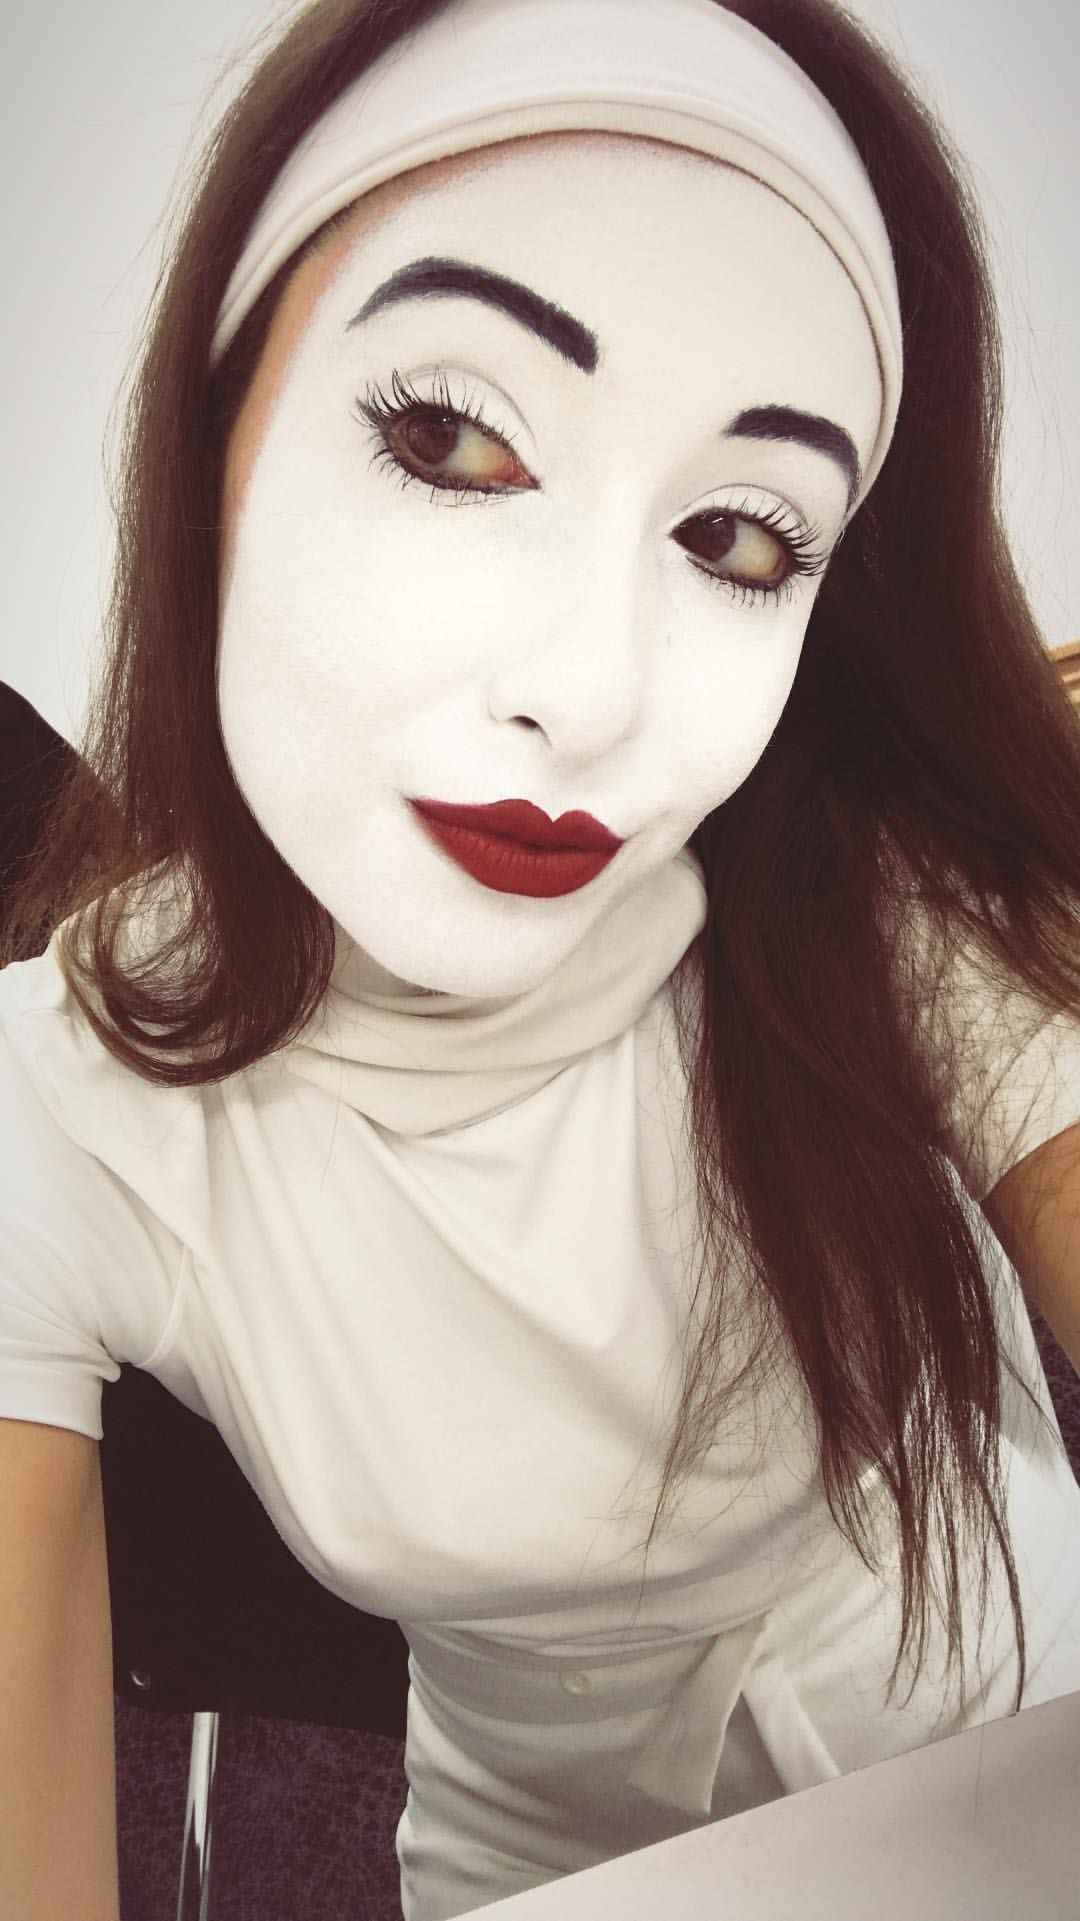 Pin by fdsgdsfgdsd on mimecore in 2020 Cute clown, Mime